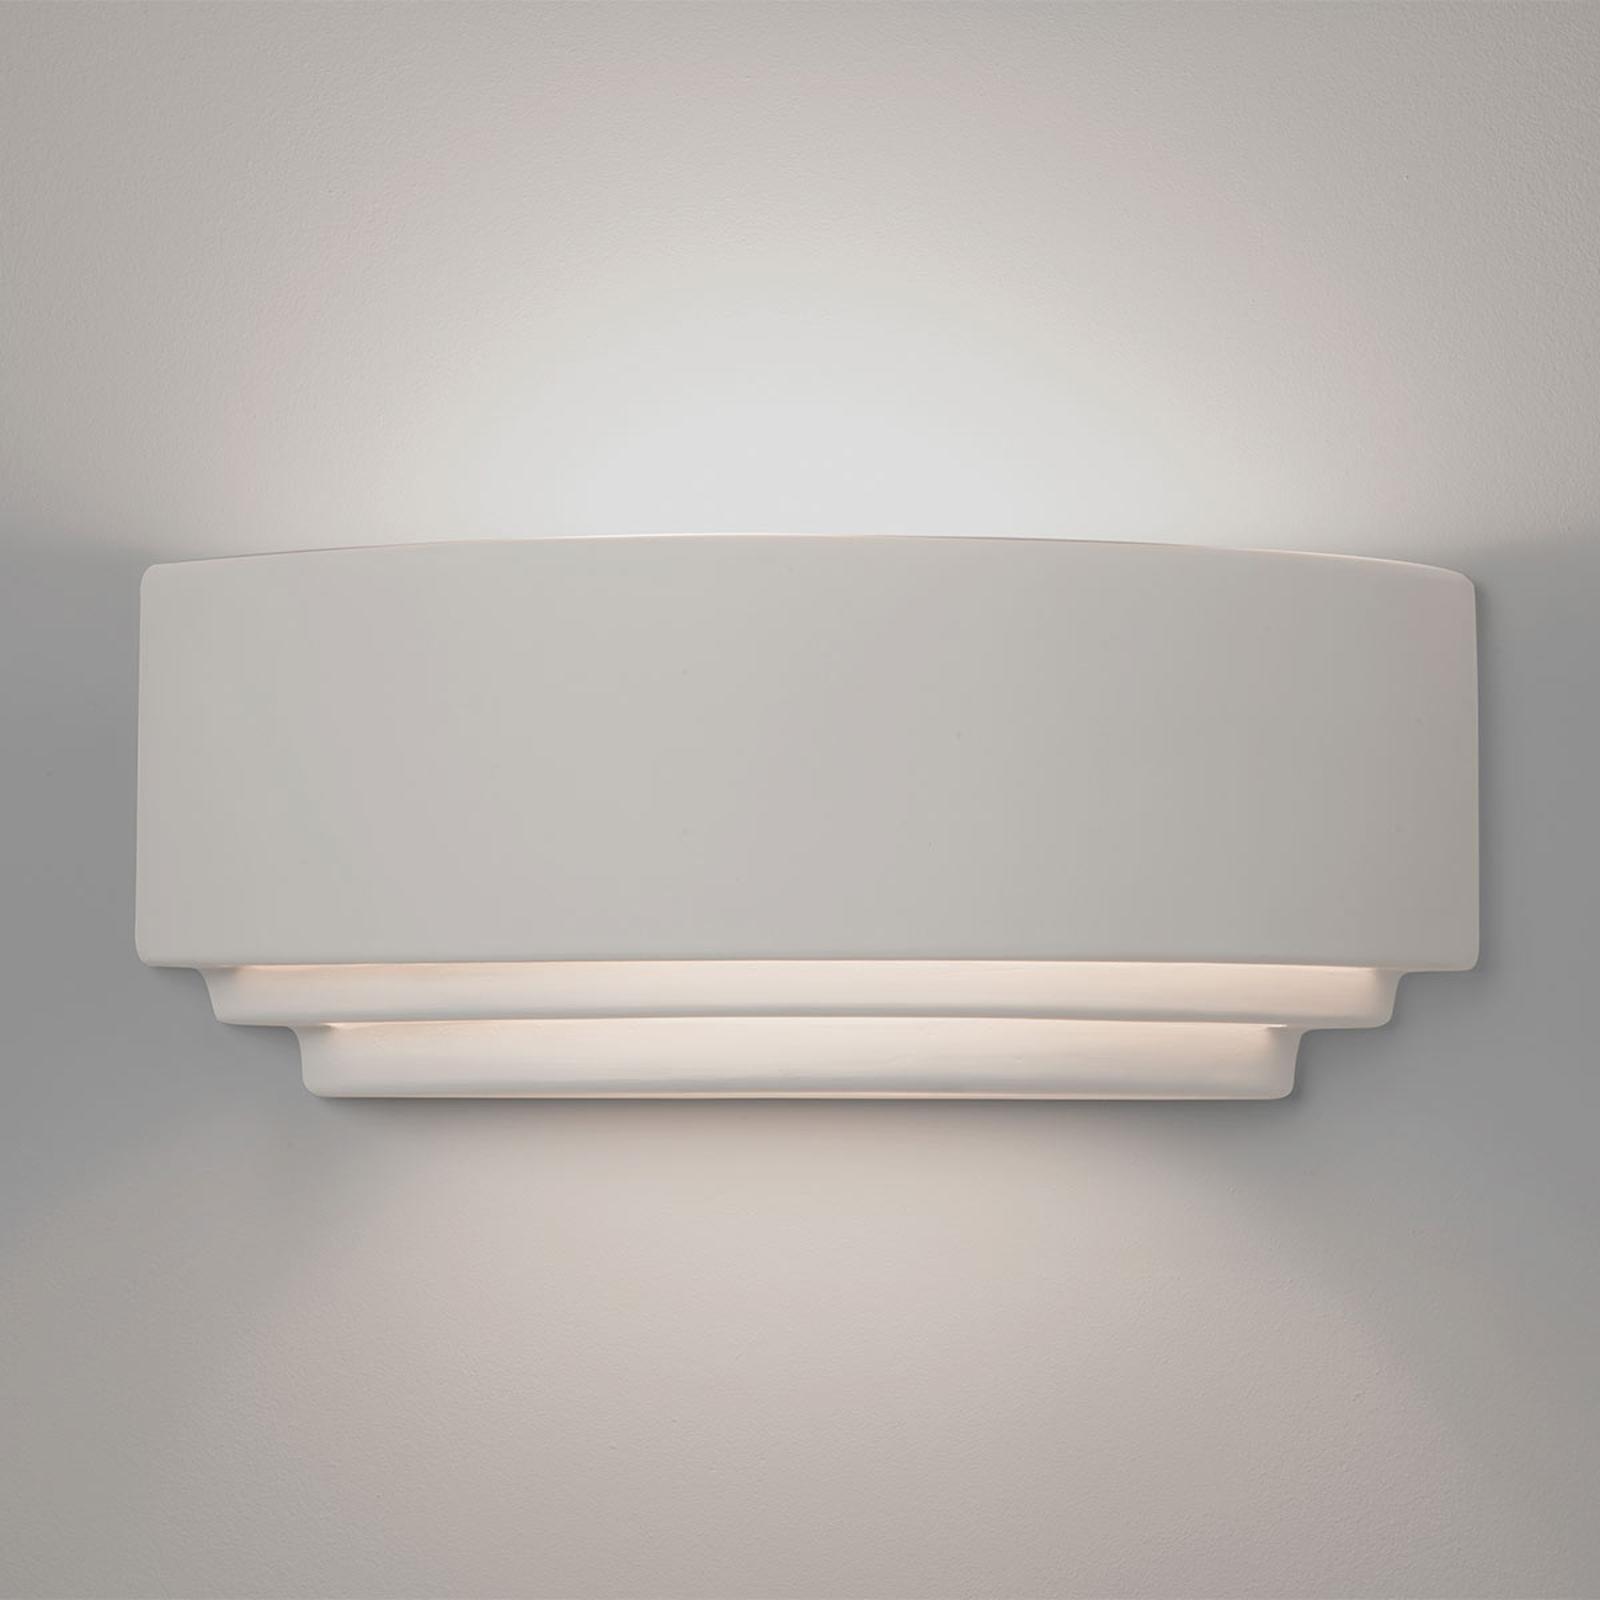 Astro Amalfi 380 applique céramique blanche 38cm